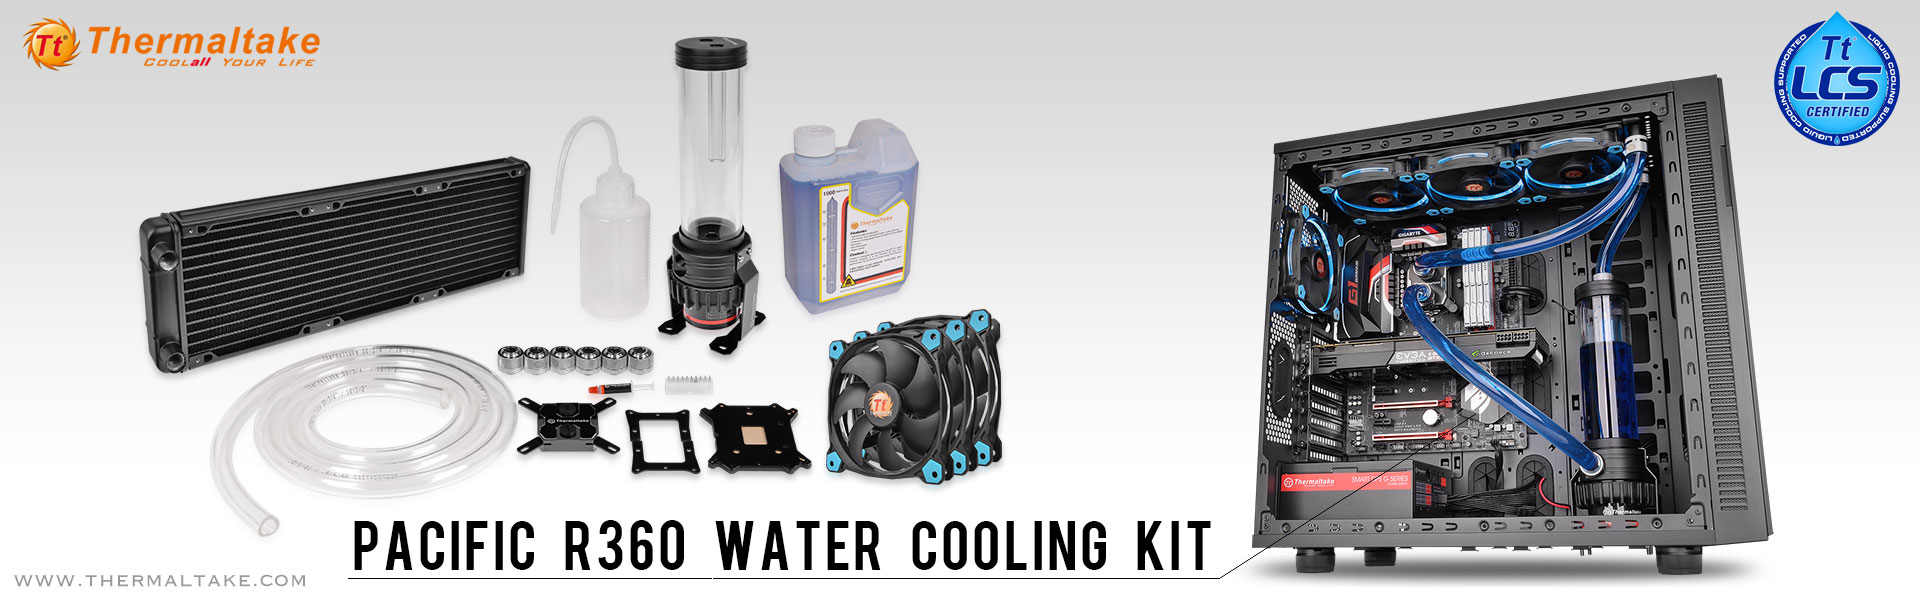 Thermaltake Pacific R360 Water Cooling Kit